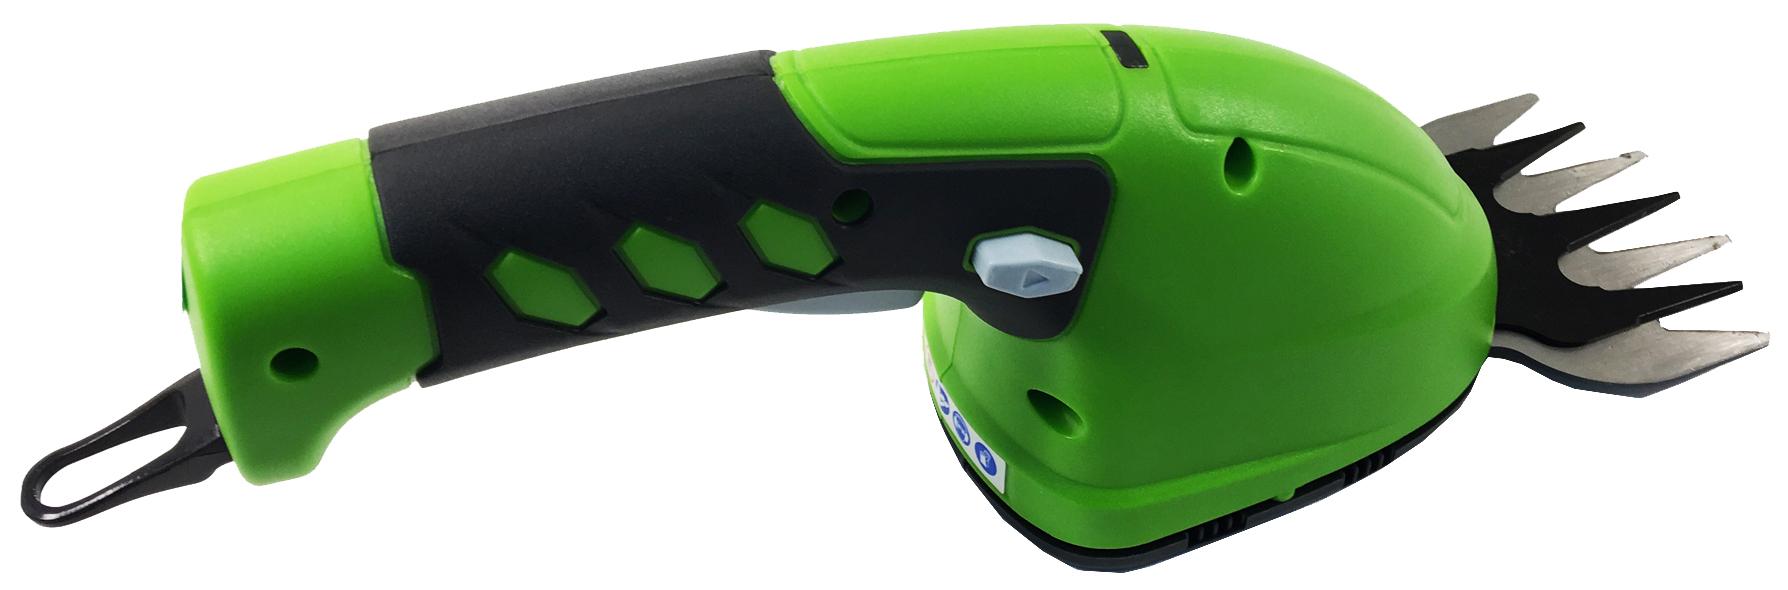 Аккумуляторные садовые ножницы Greenworks 3,6V GW 2903307